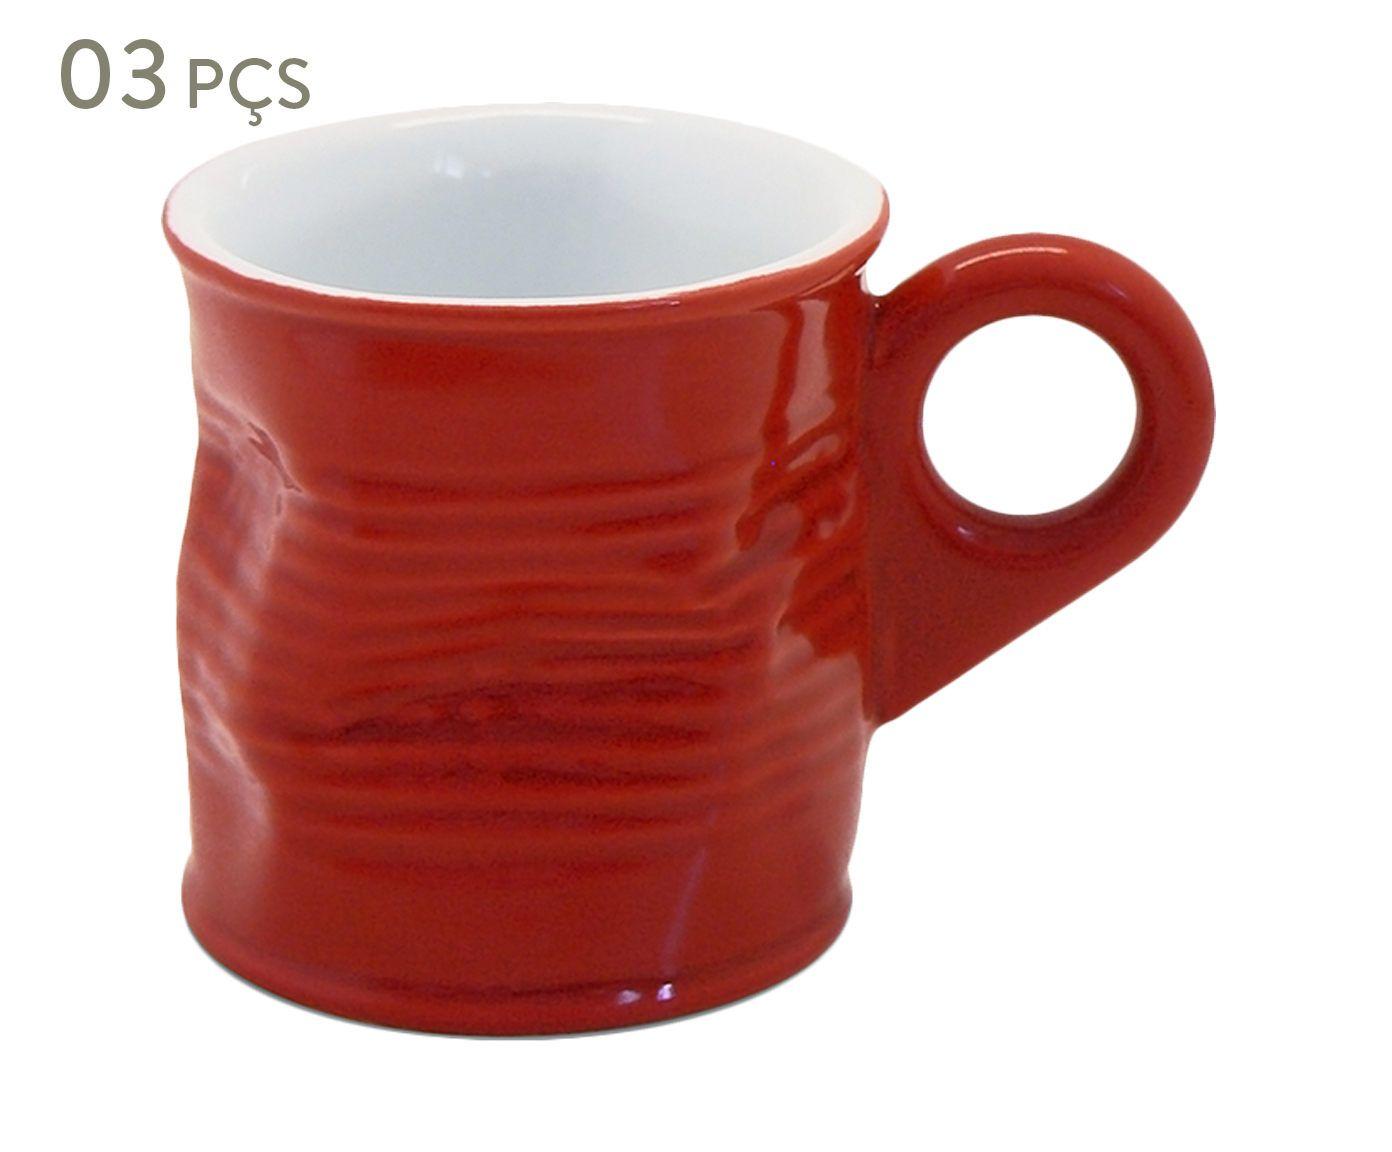 Conjunto de Xícaras para café Smashed - rouge 70 ml | Westwing.com.br